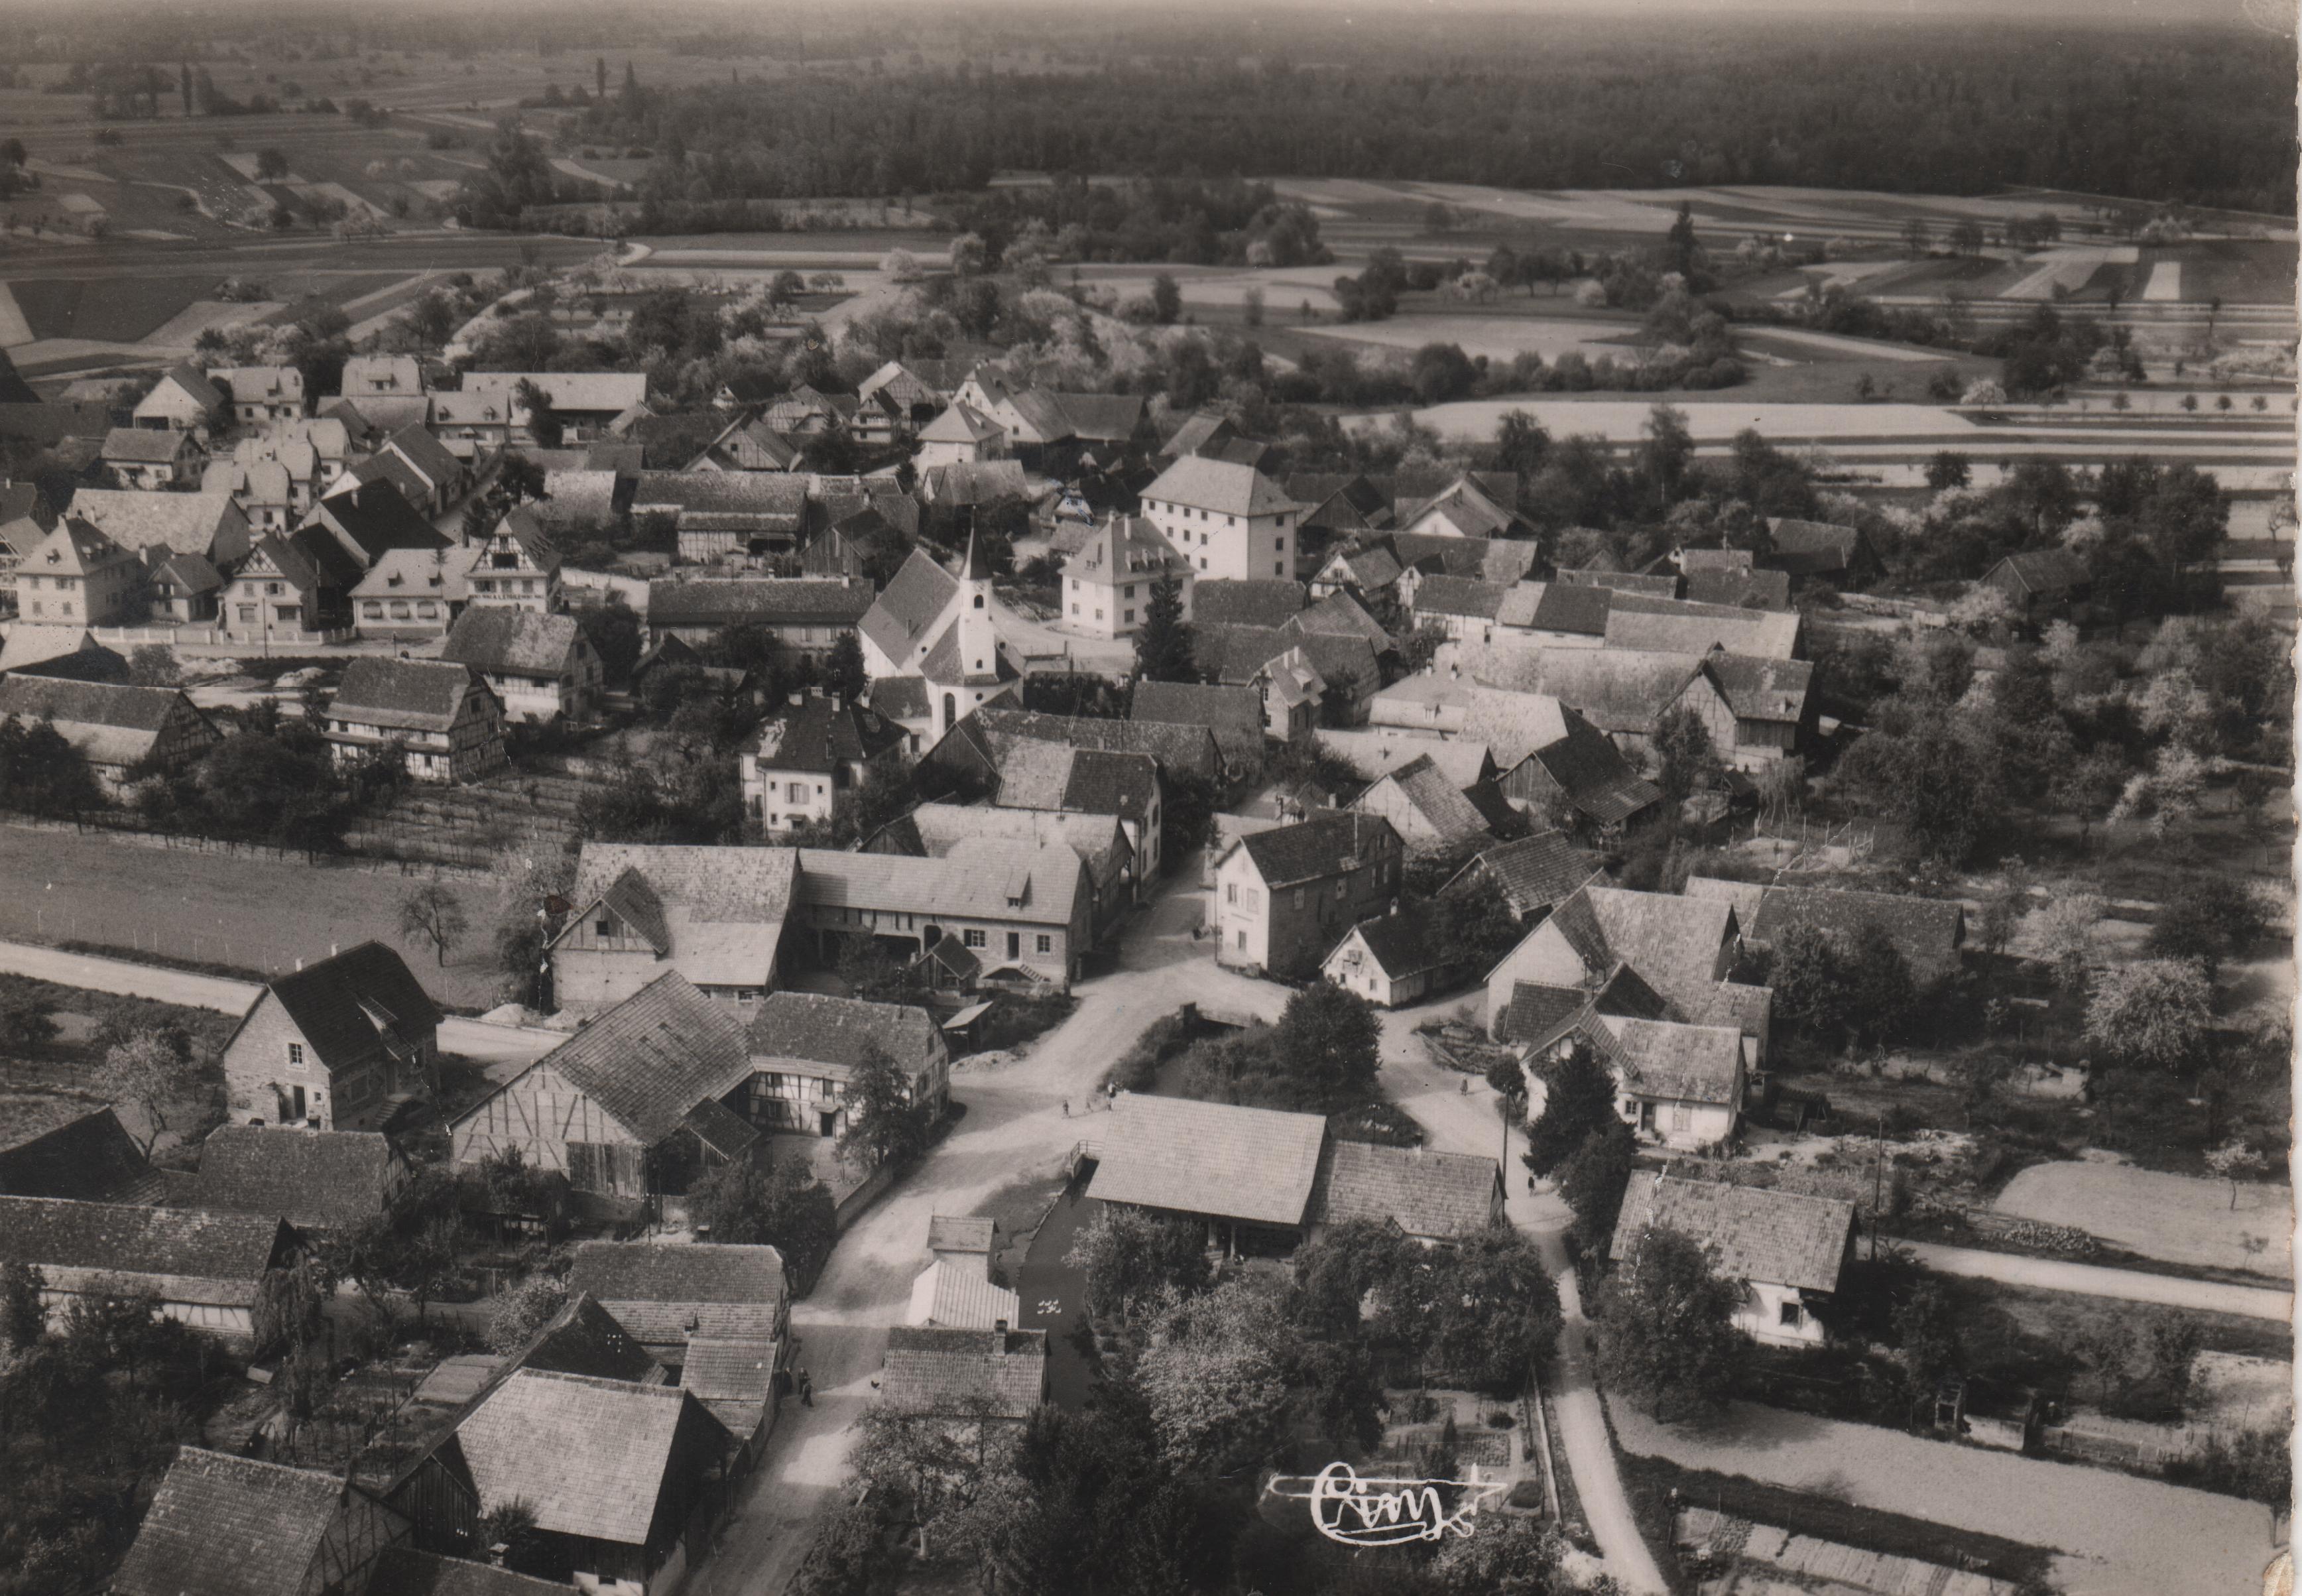 Schoenau 1950